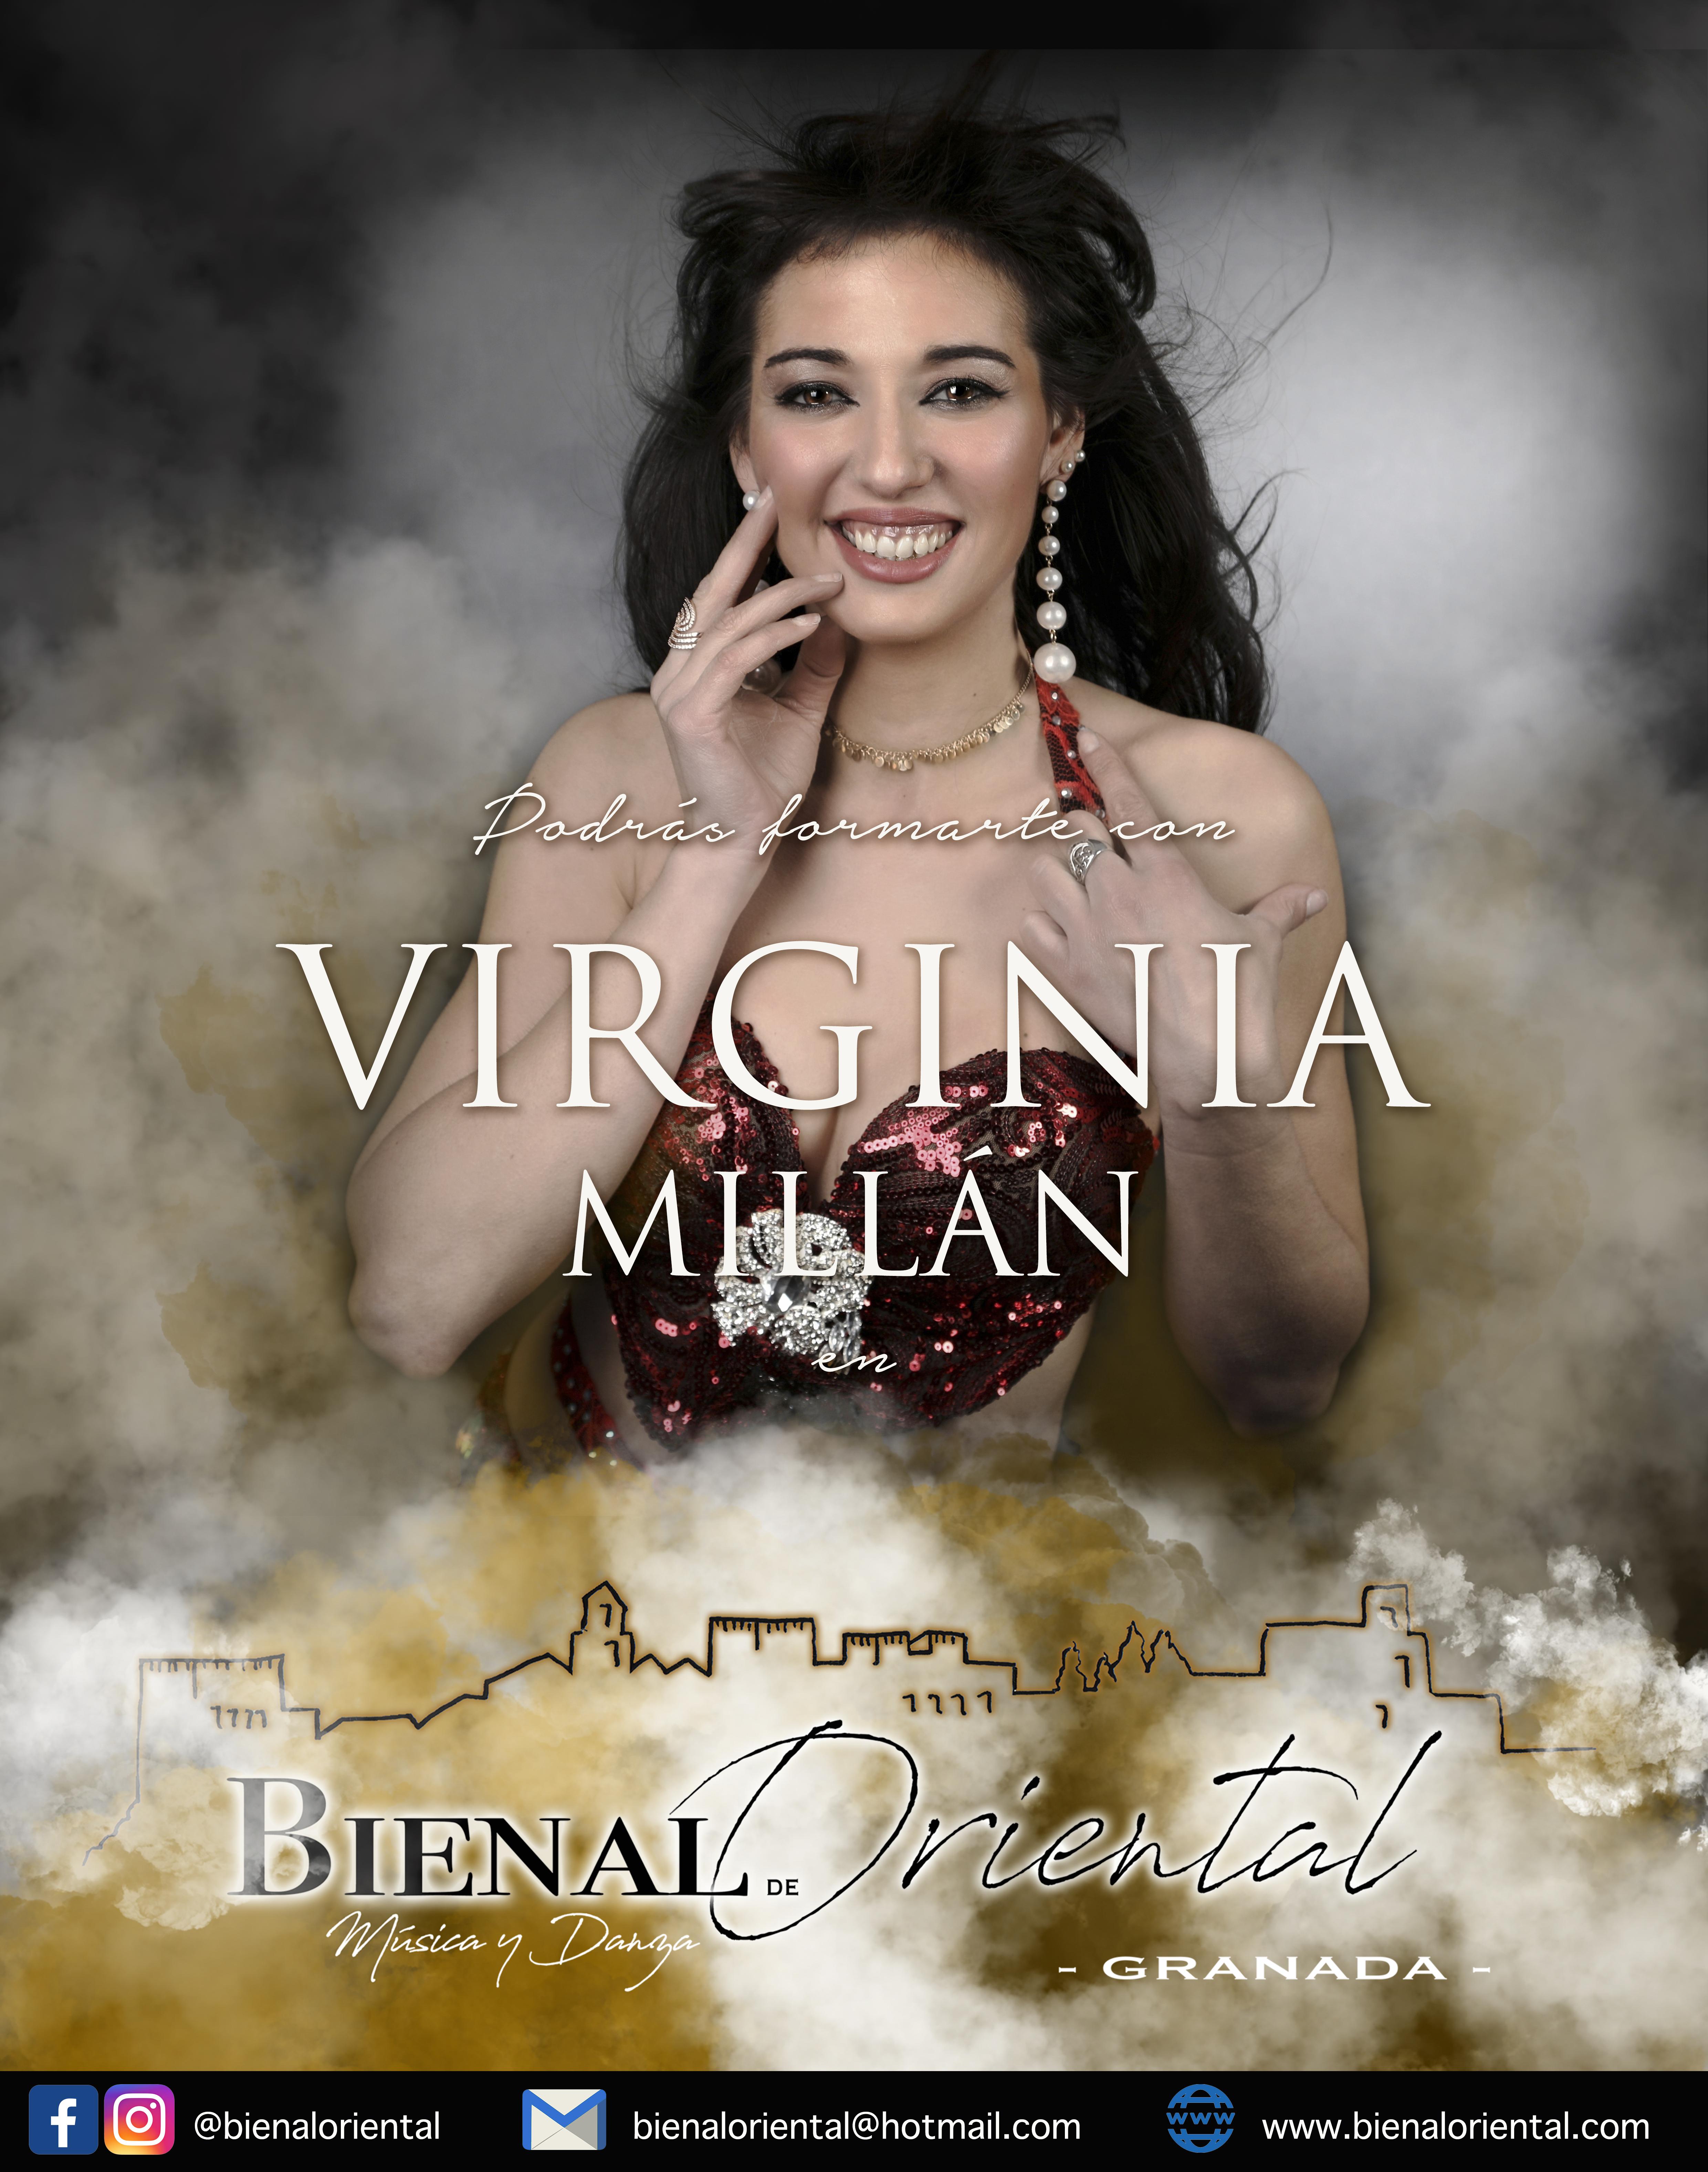 VIRGINIA MILLÁN - FRANCIA